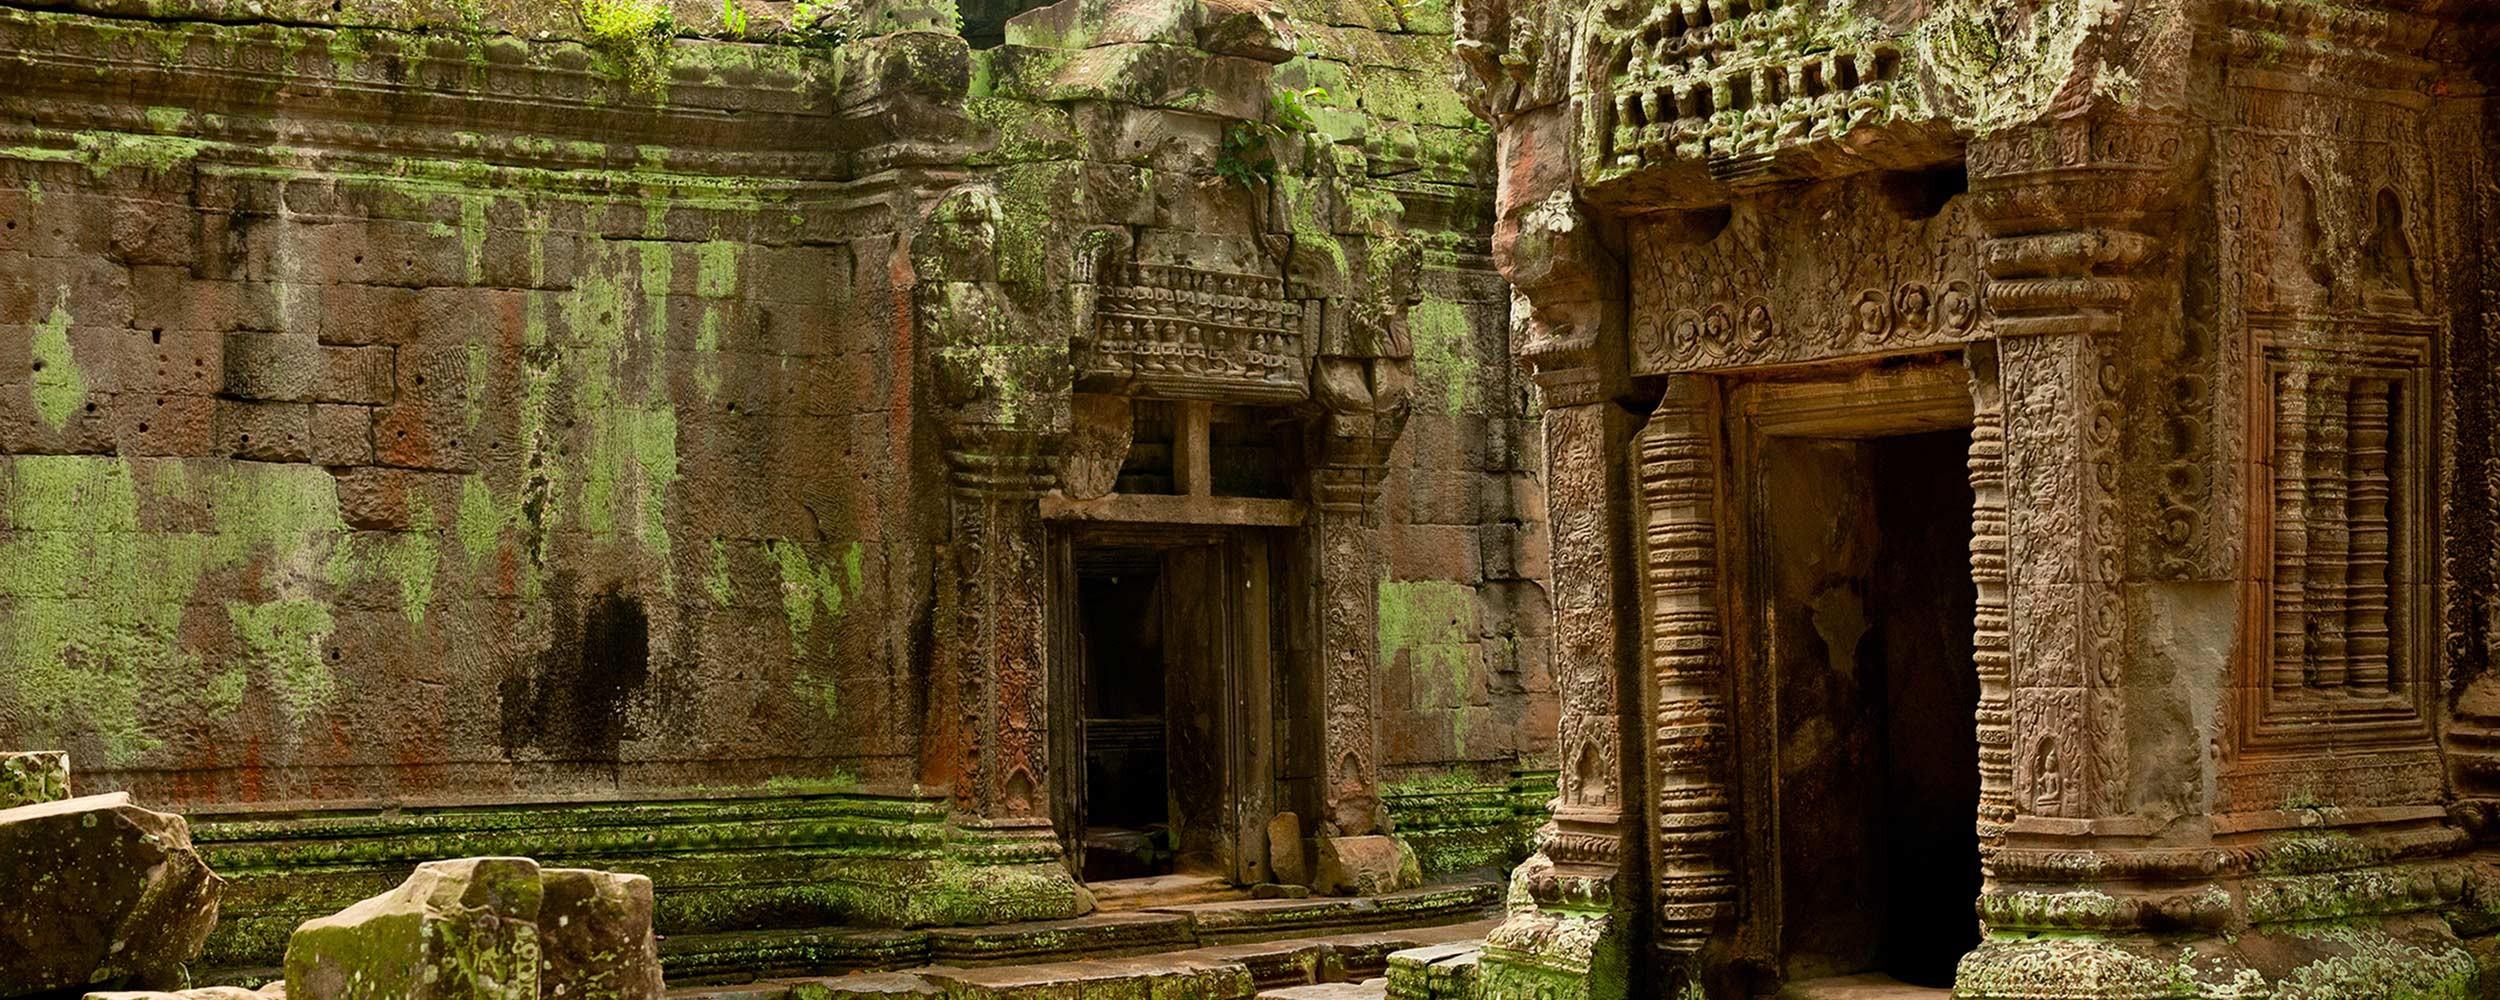 Cambodge Siem Reap ruines